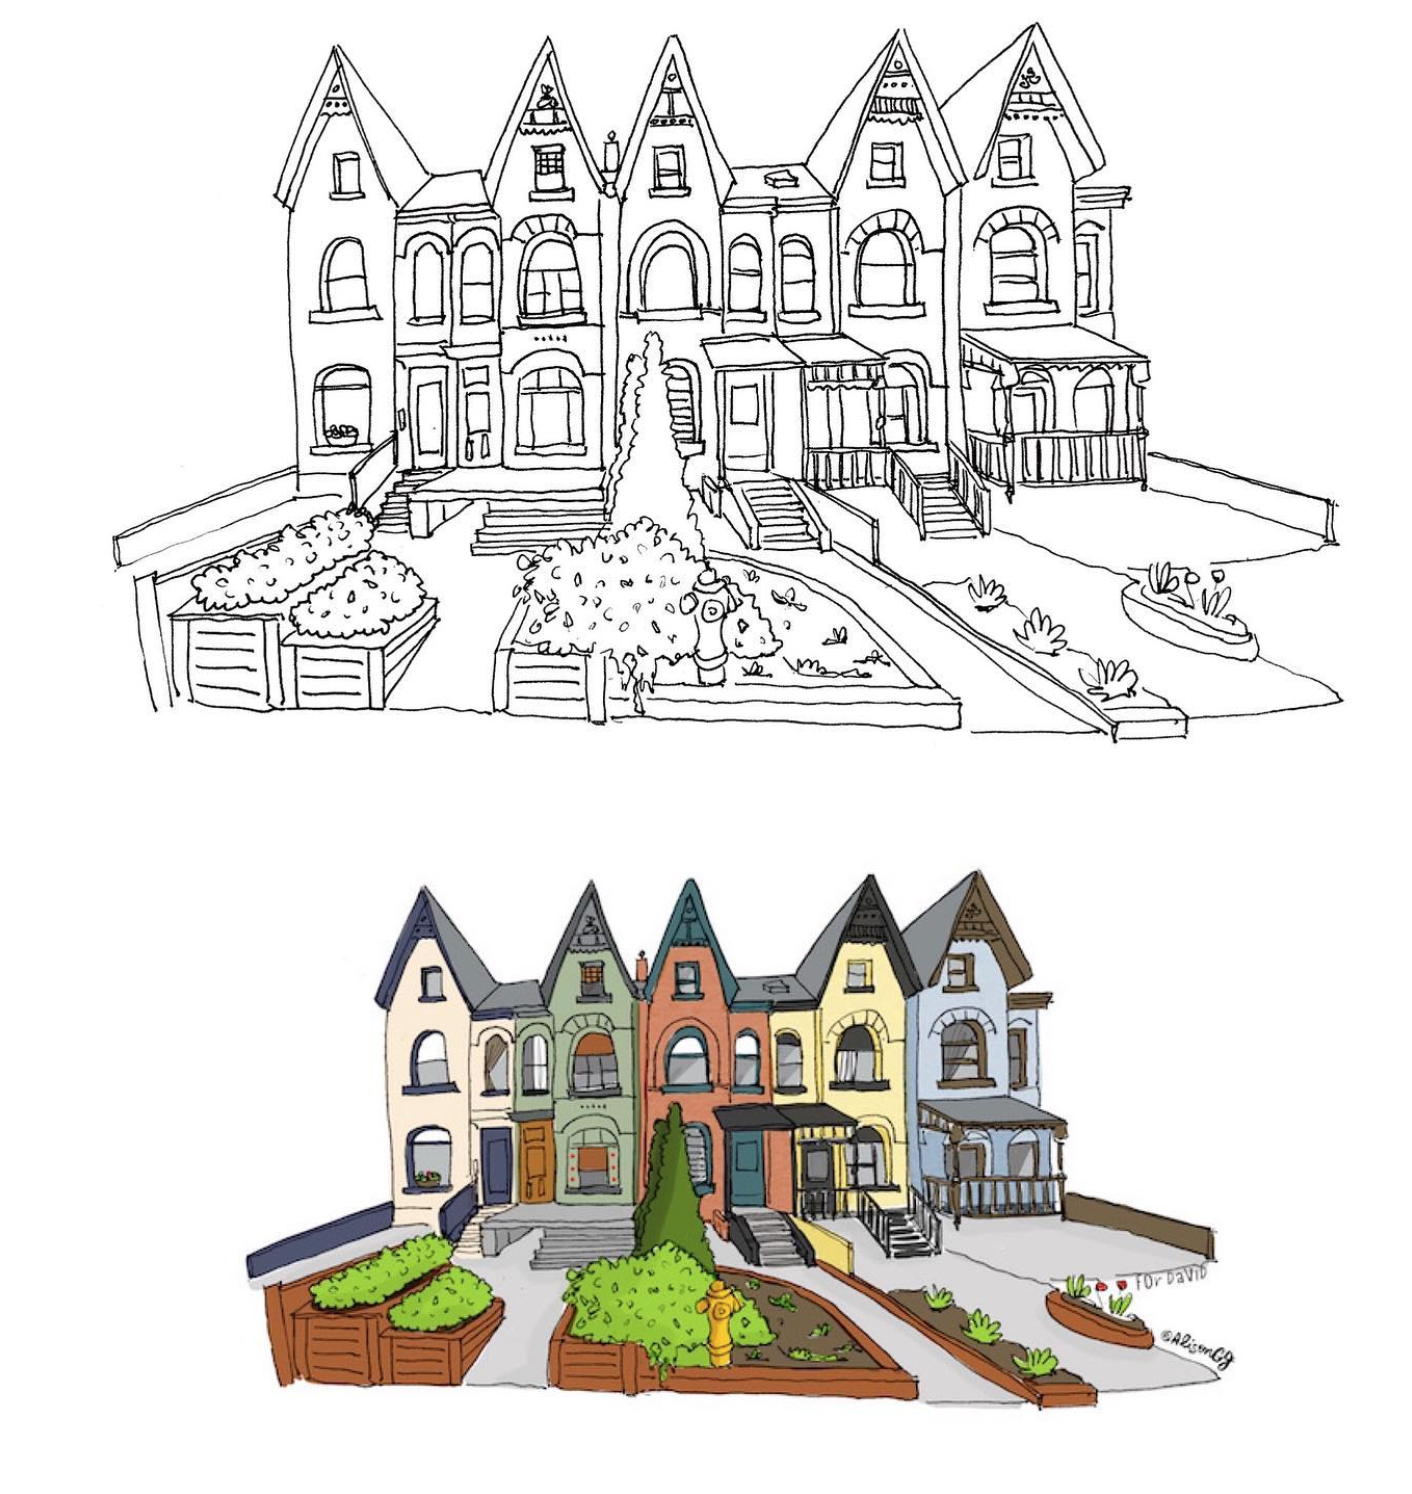 Houses in Toronto's Annex drawn by Alison Garwood-Jones